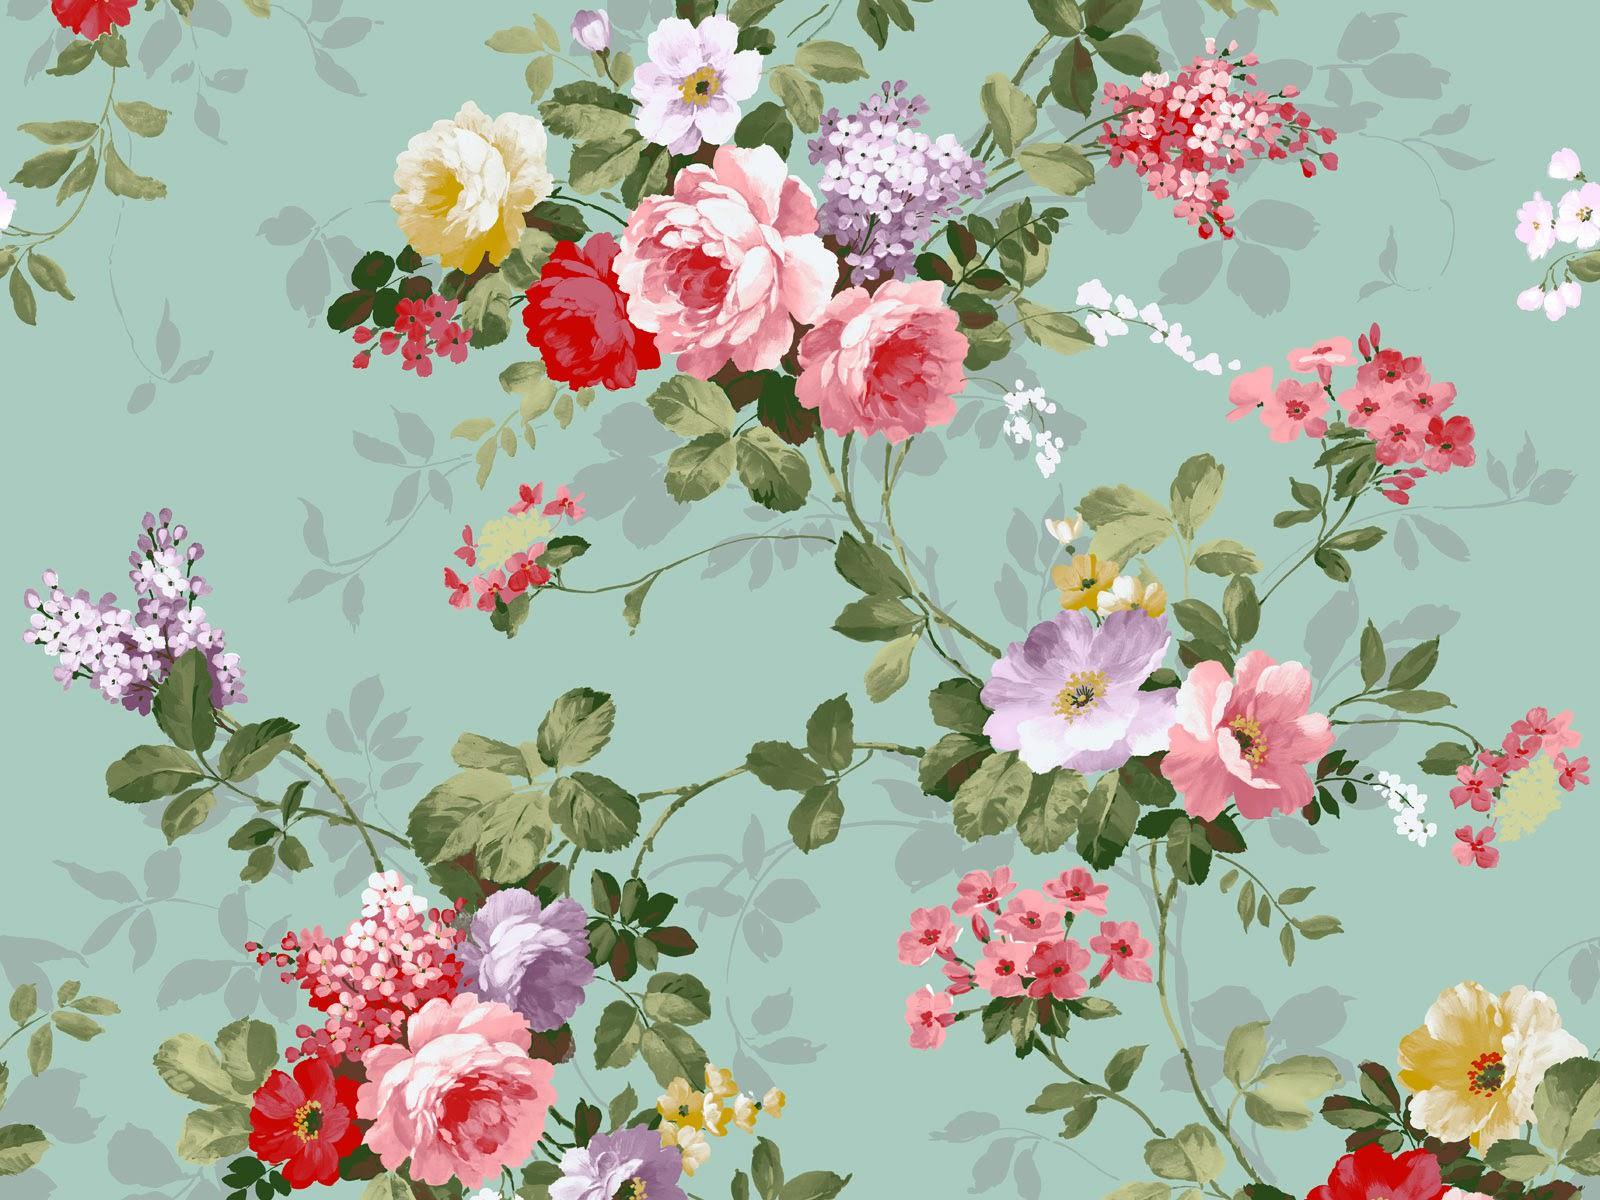 Download Classic Floral Vintage Design Wallpaper 1600x1200